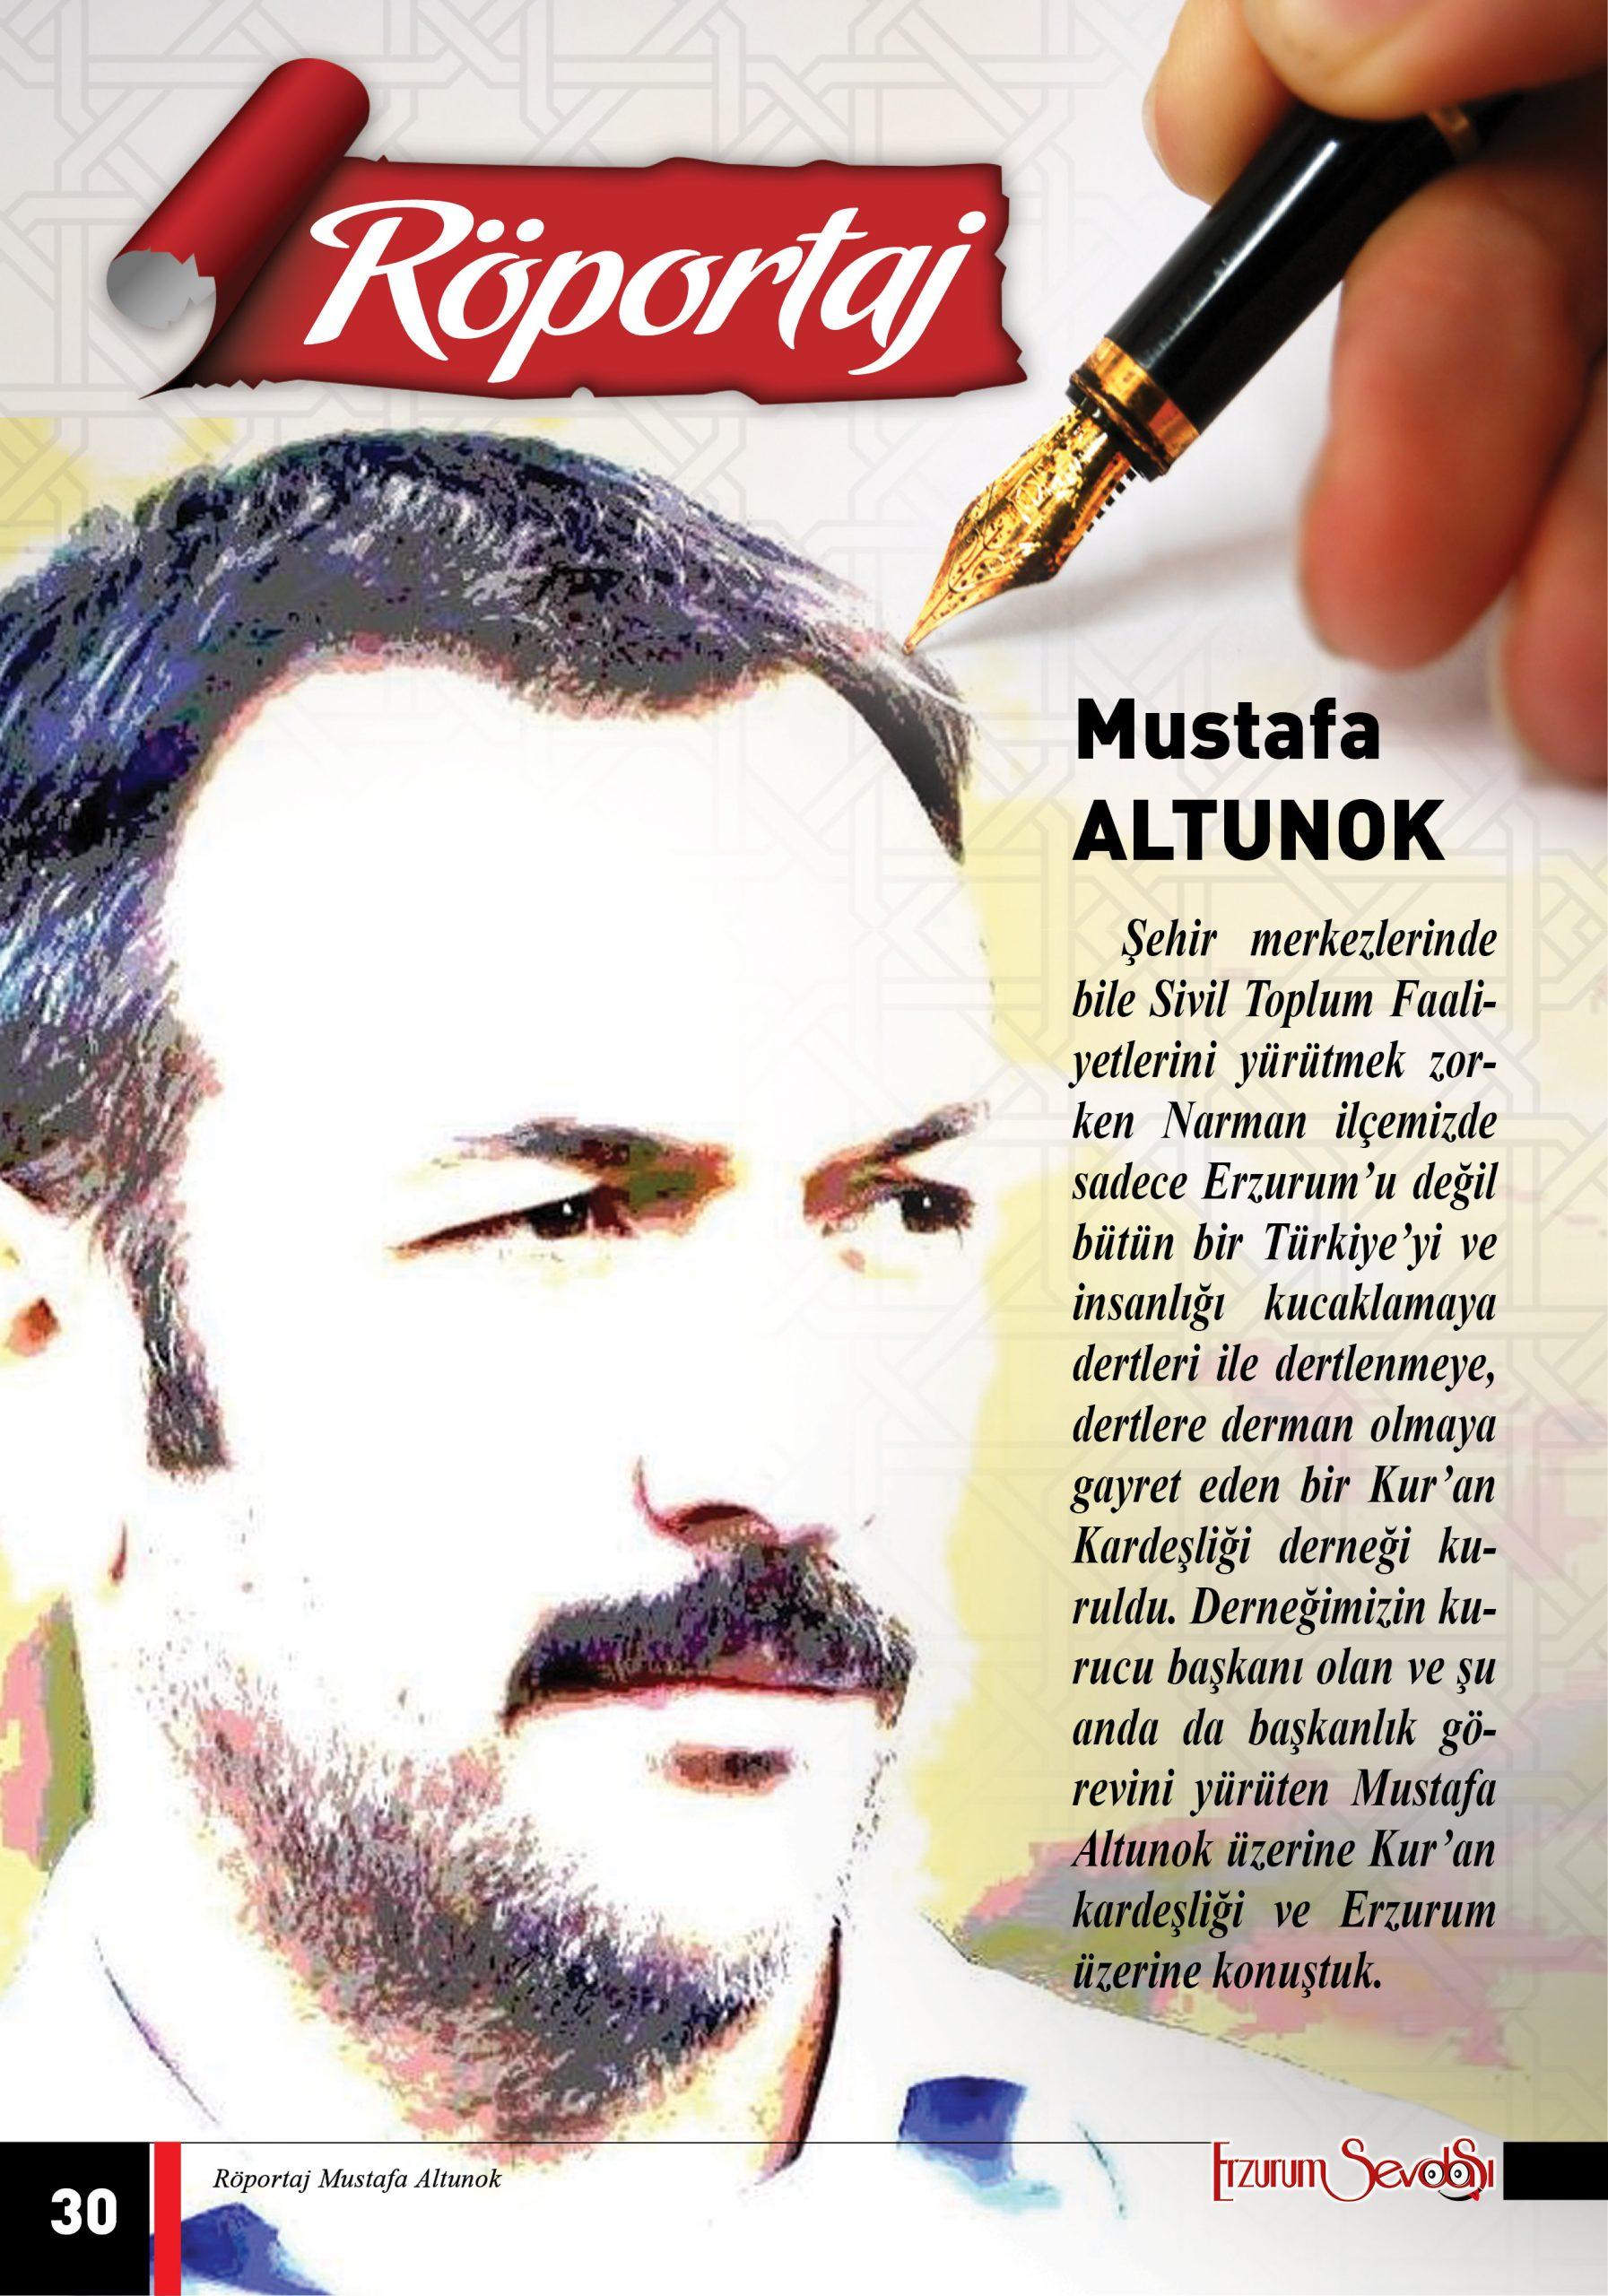 Mustafa Altunok İle Röportaj